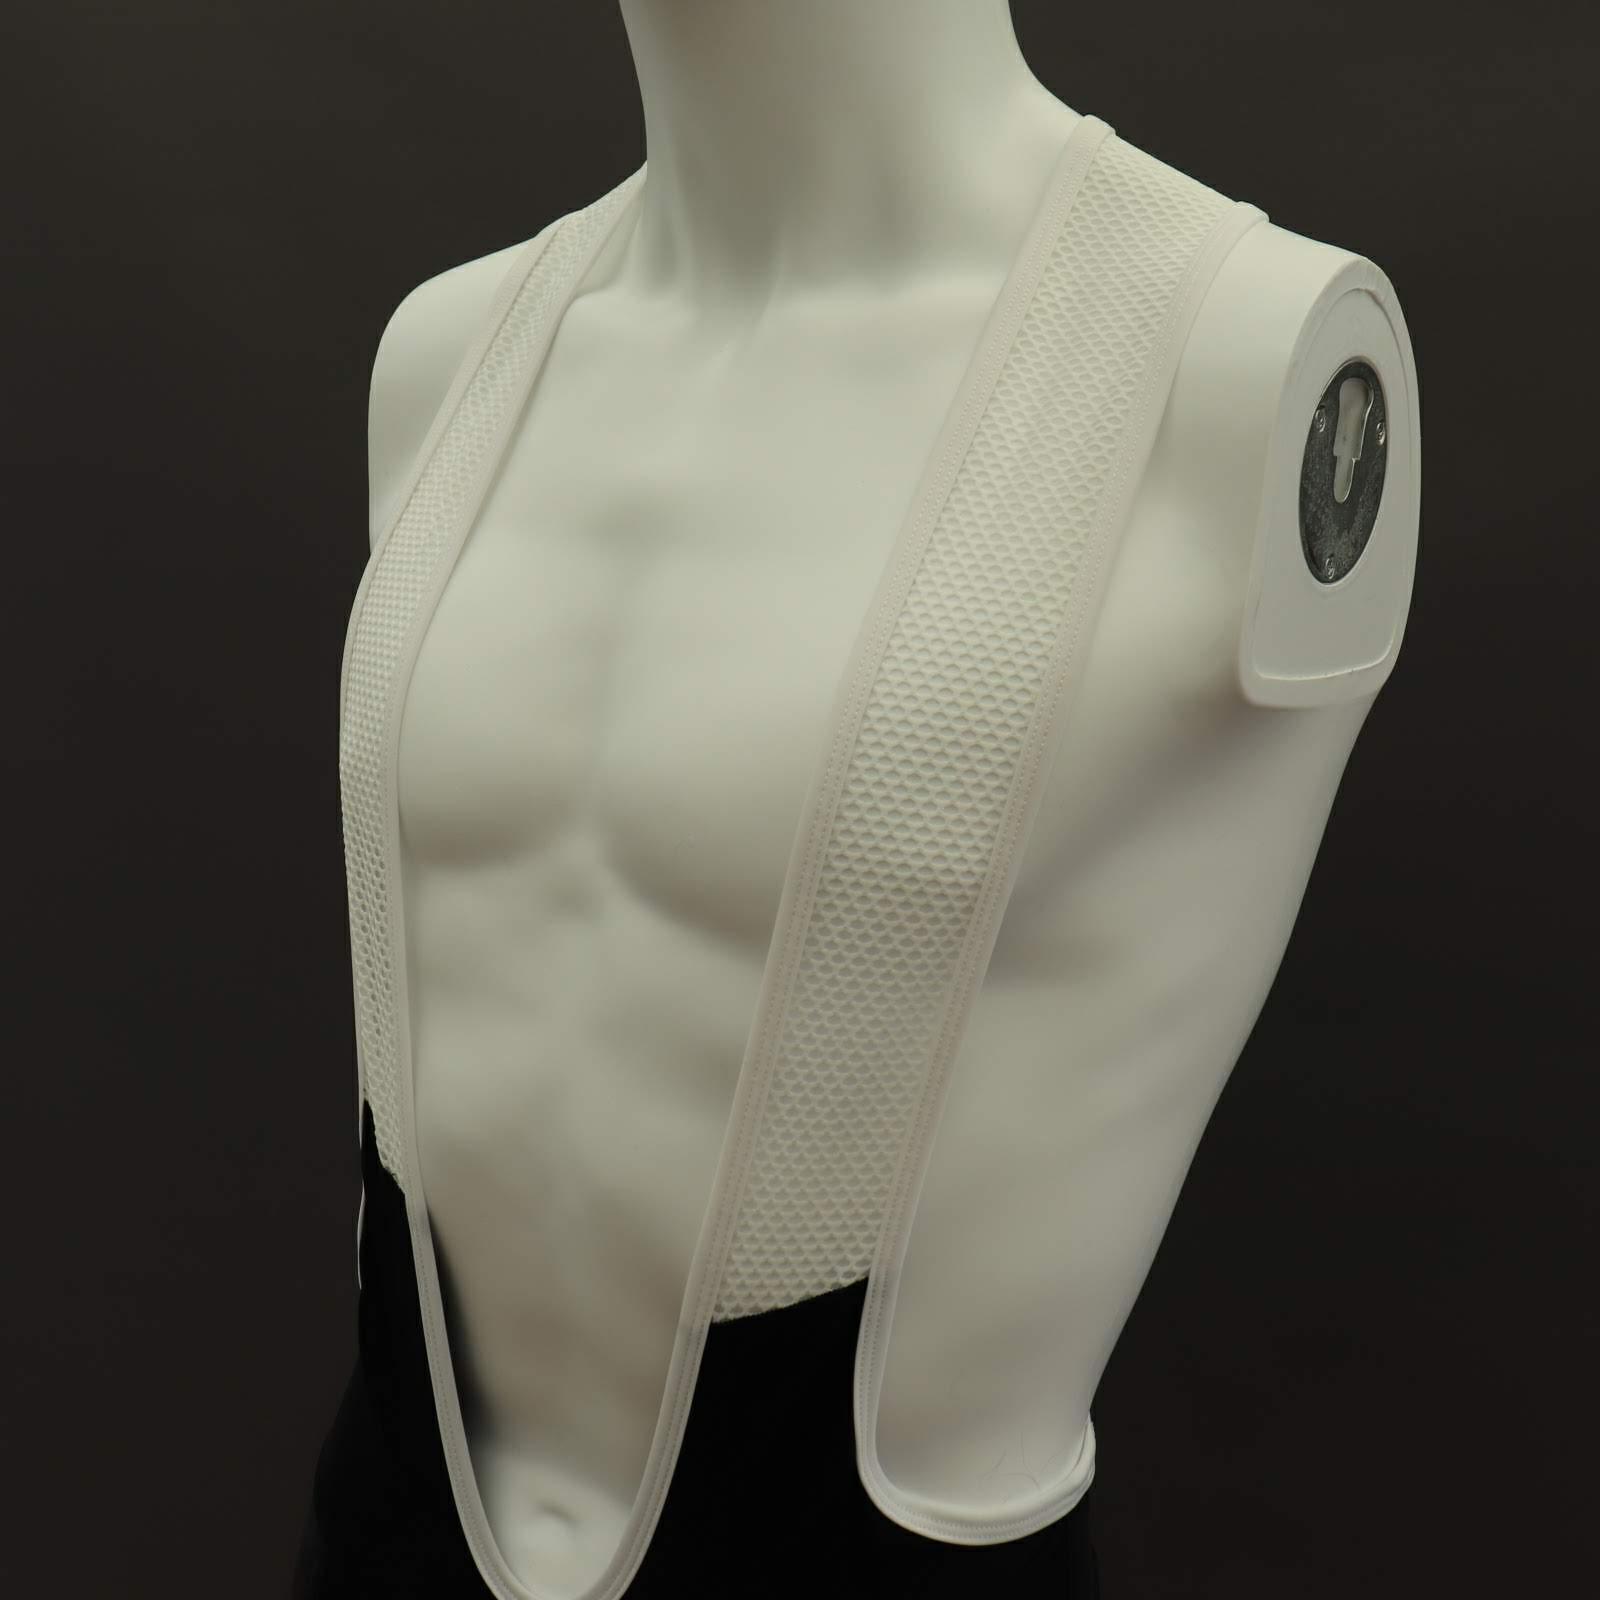 Pro Cycle Shorts - White Comfort Bib